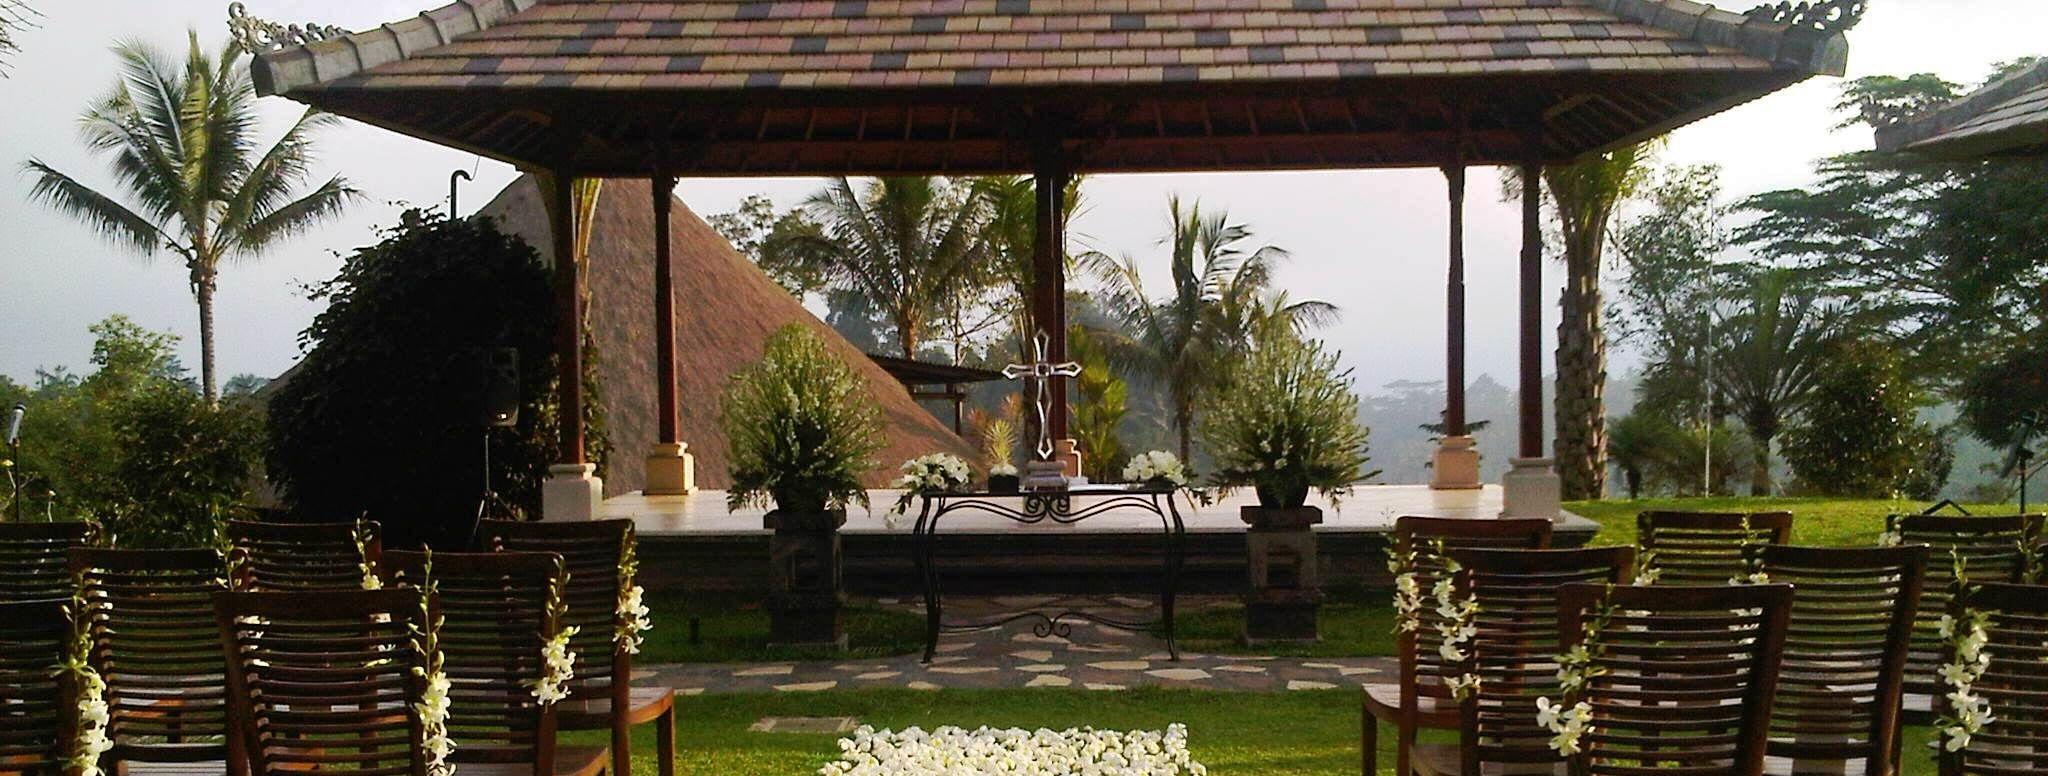 Bagus Jati Health&Wellbeing Resortバグーズ・ジャティ・ヘルス&ウェルビーング・リゾート